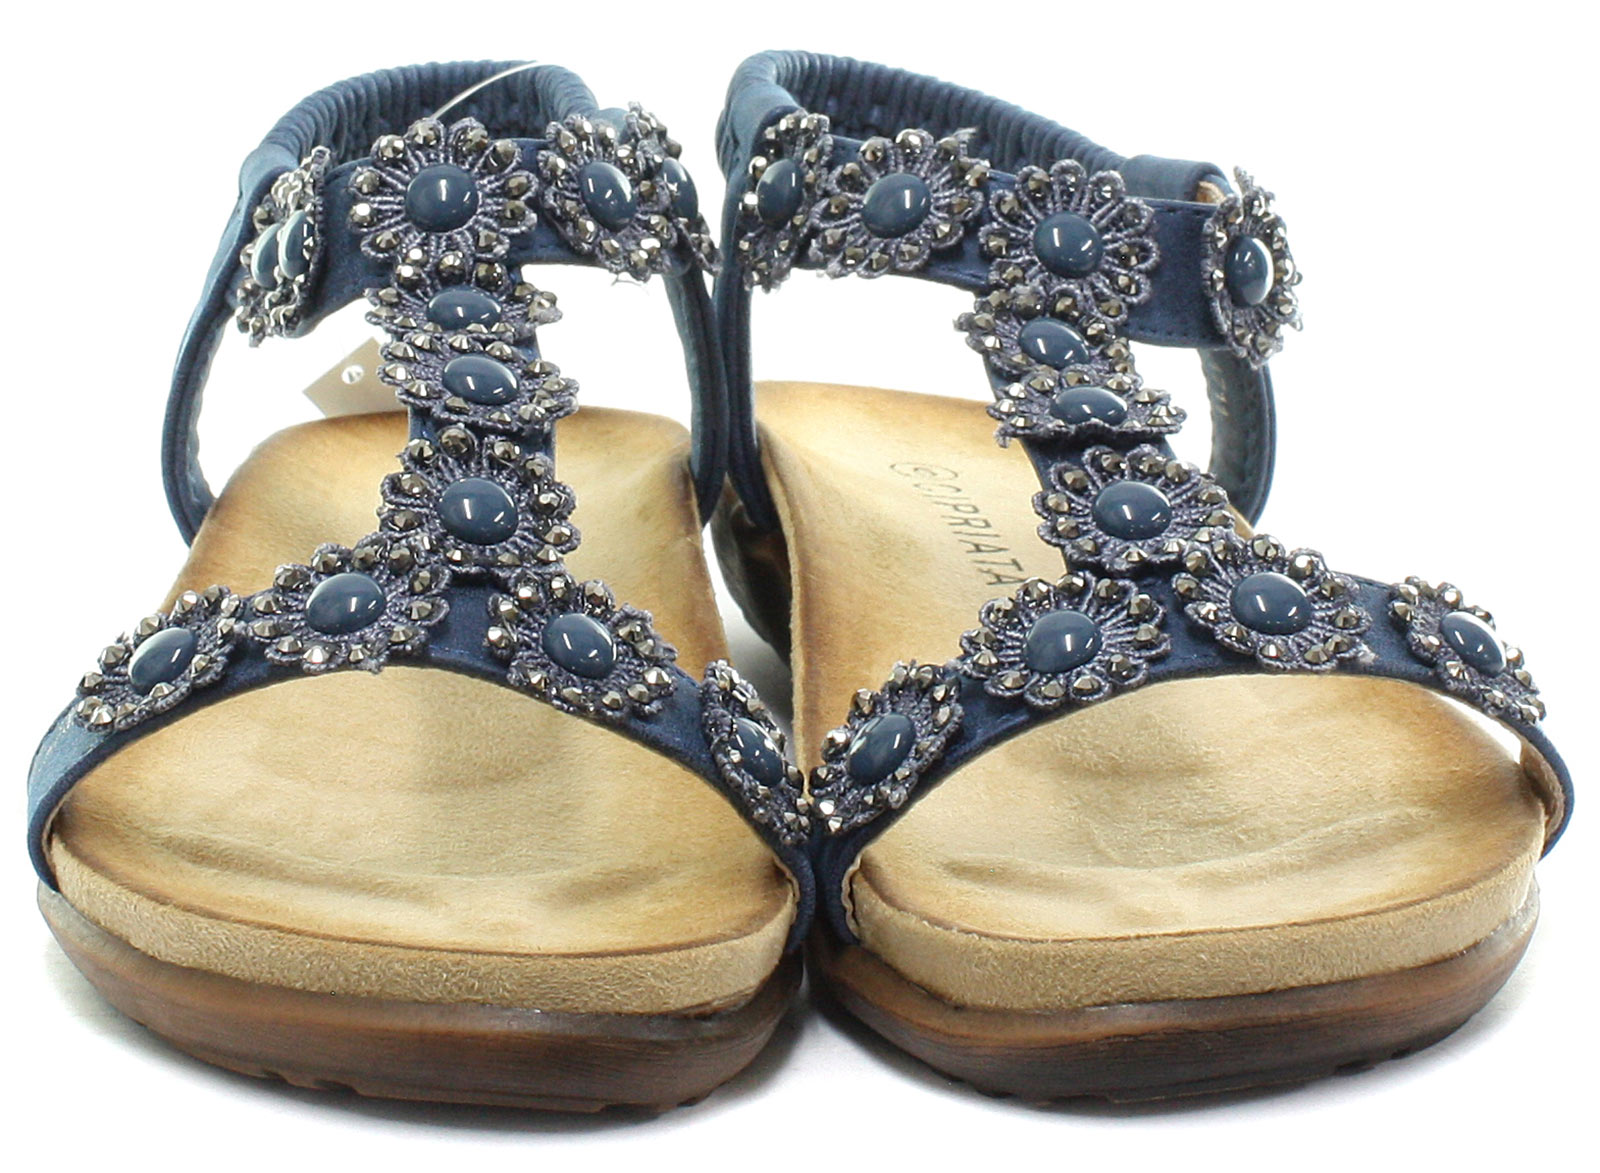 New-Cipriata-Giovanna-Navy-Flower-Womens-Halter-Back-Sandals-ALL-SIZES miniature 2